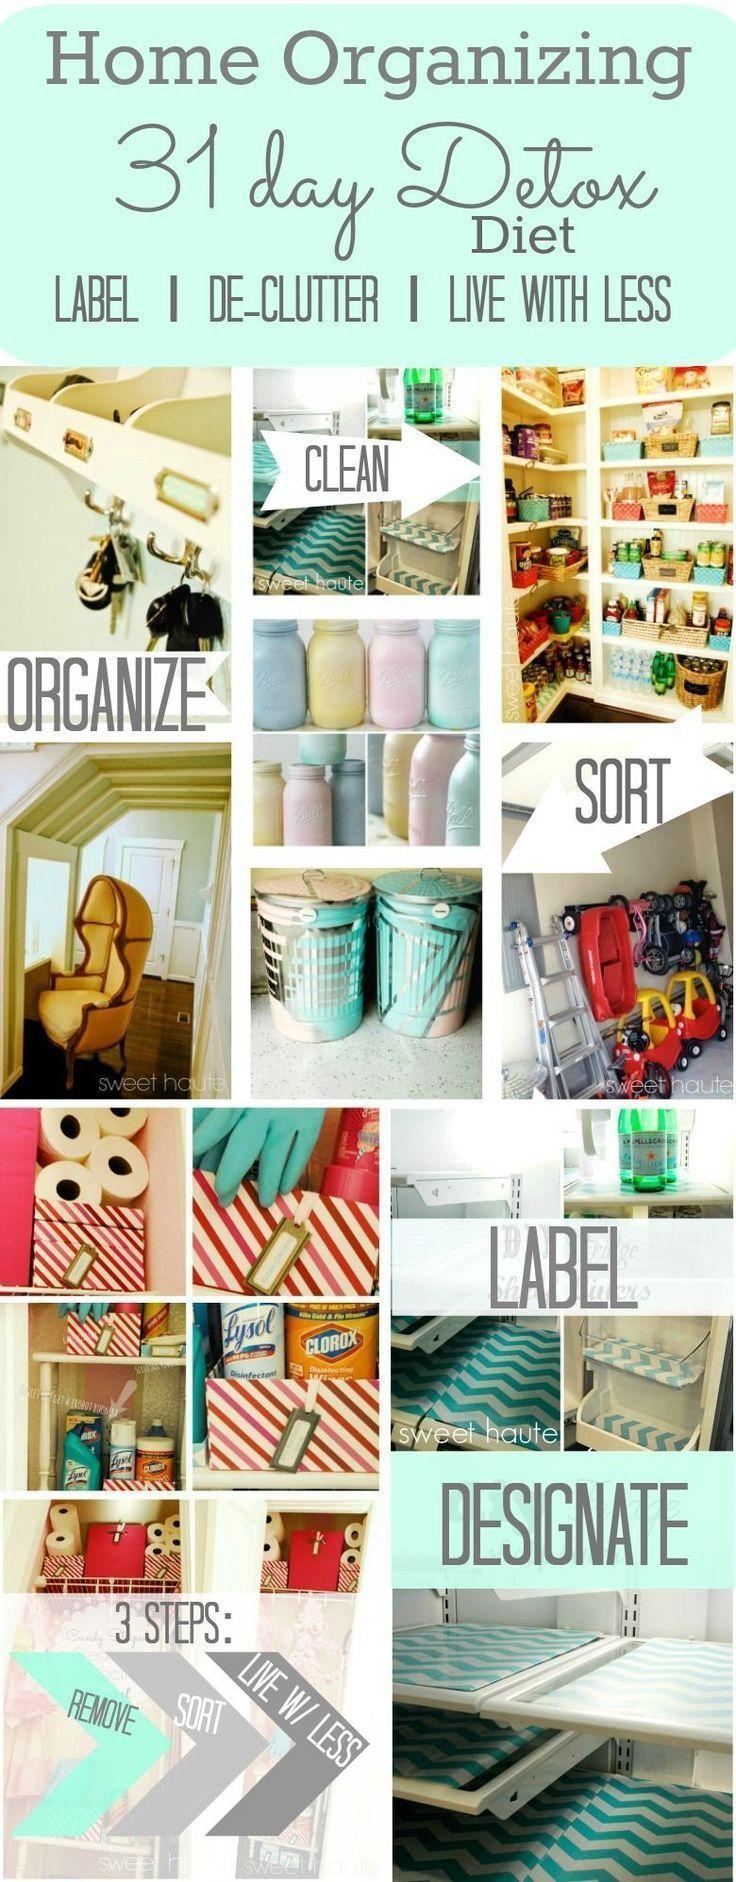 Home Organizing 31-Tage-Detox-Diät Home Organize – 3 Tage Detox-Diät   – Detox Rezepte